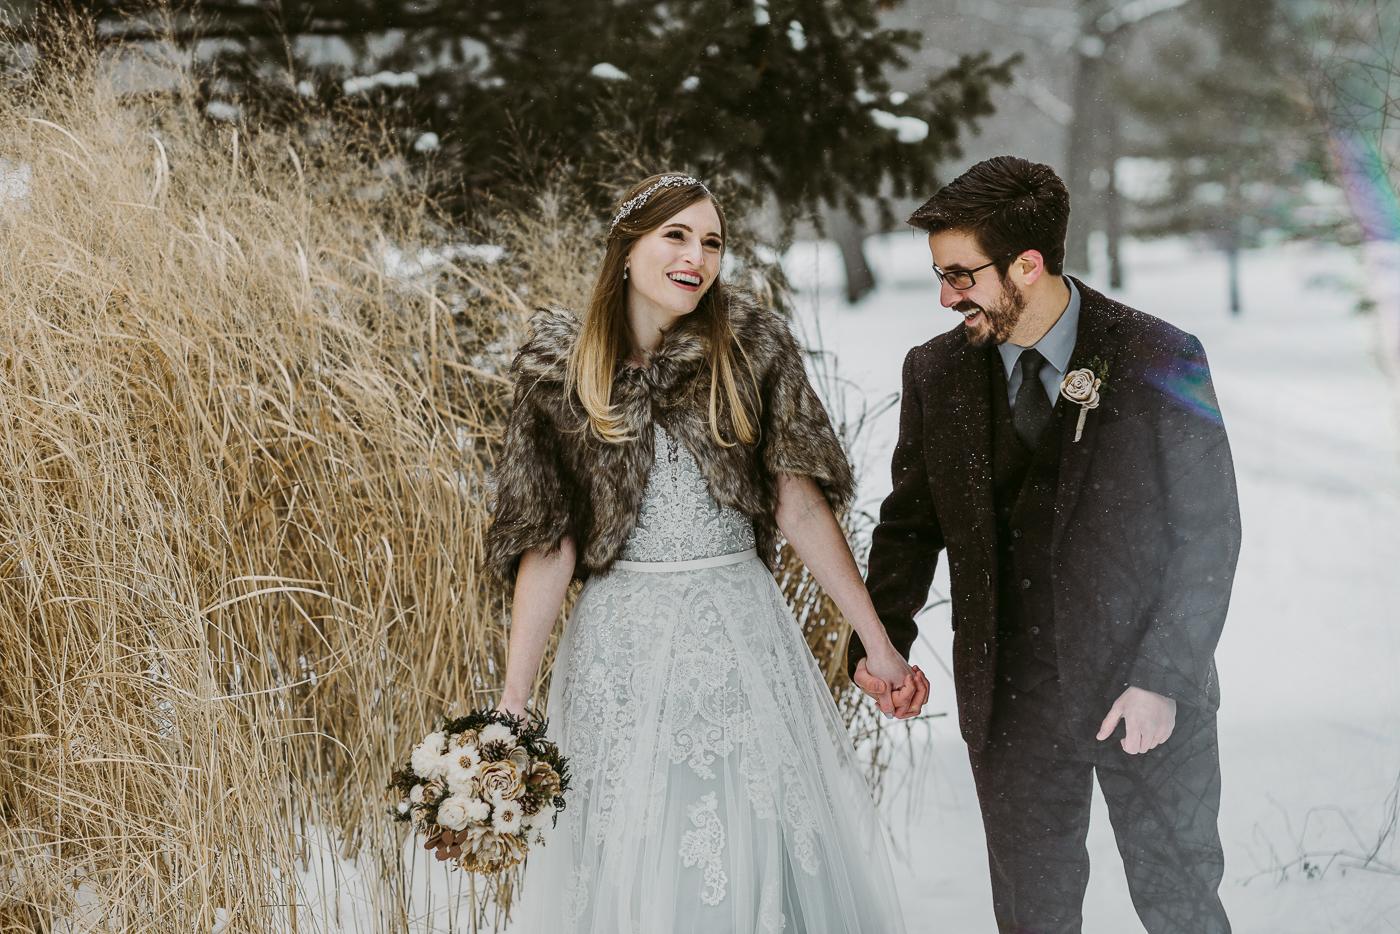 Squires-Castle-Winter-Wedding-16.jpg